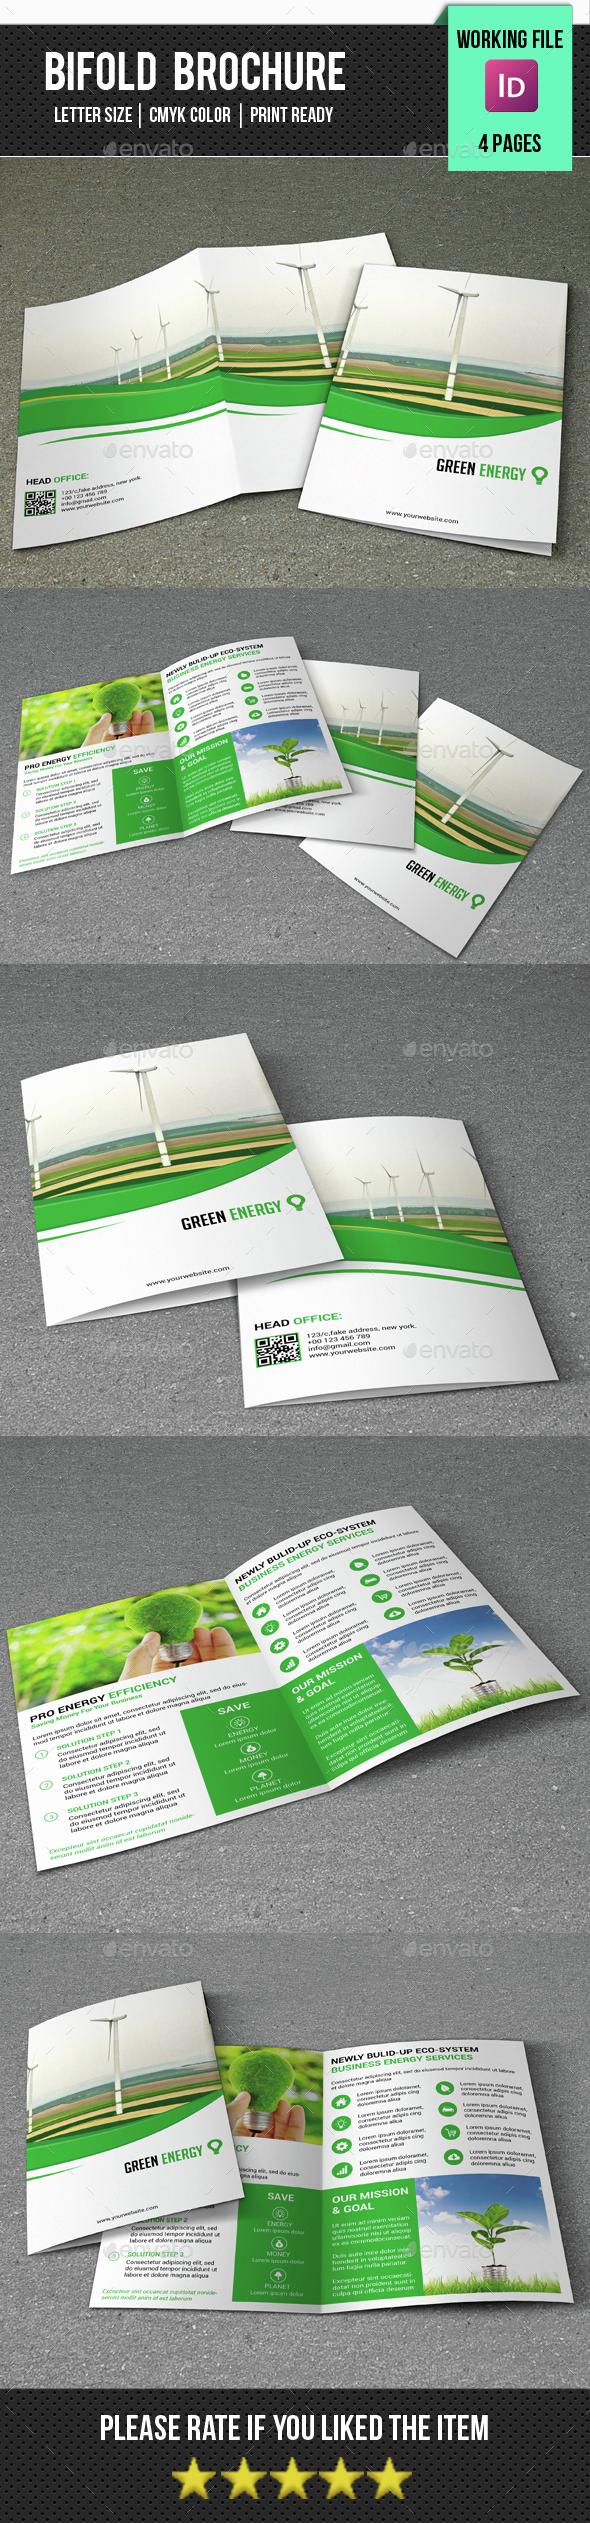 Green Energy Brochure-V372 - Corporate Brochures